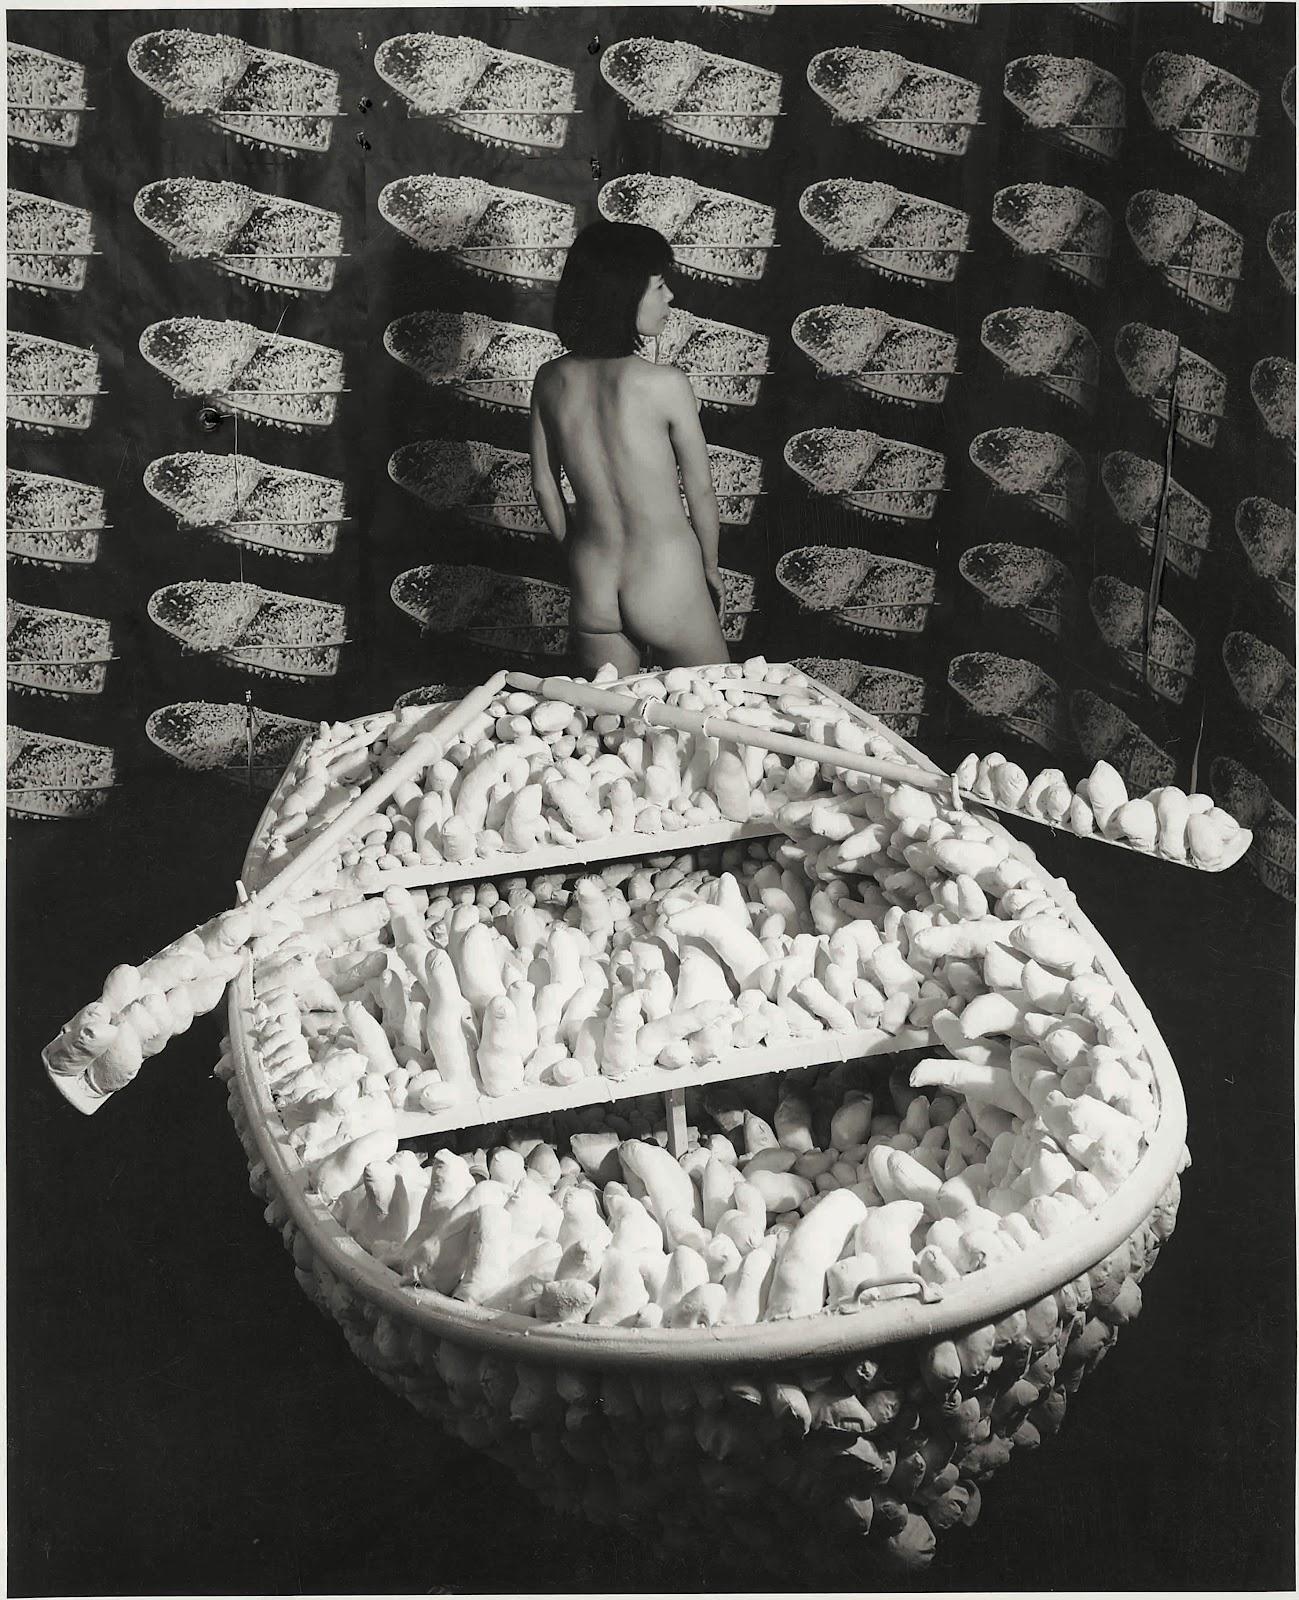 Yayoi Kusama Kusama posing in Aggregation- One Thousand Boats Show 1963 installation view, Gertrude Stein Gallery, New York 1963 © Yayoi Kusama and © Yayoi Kusama Studios Inc.jpg